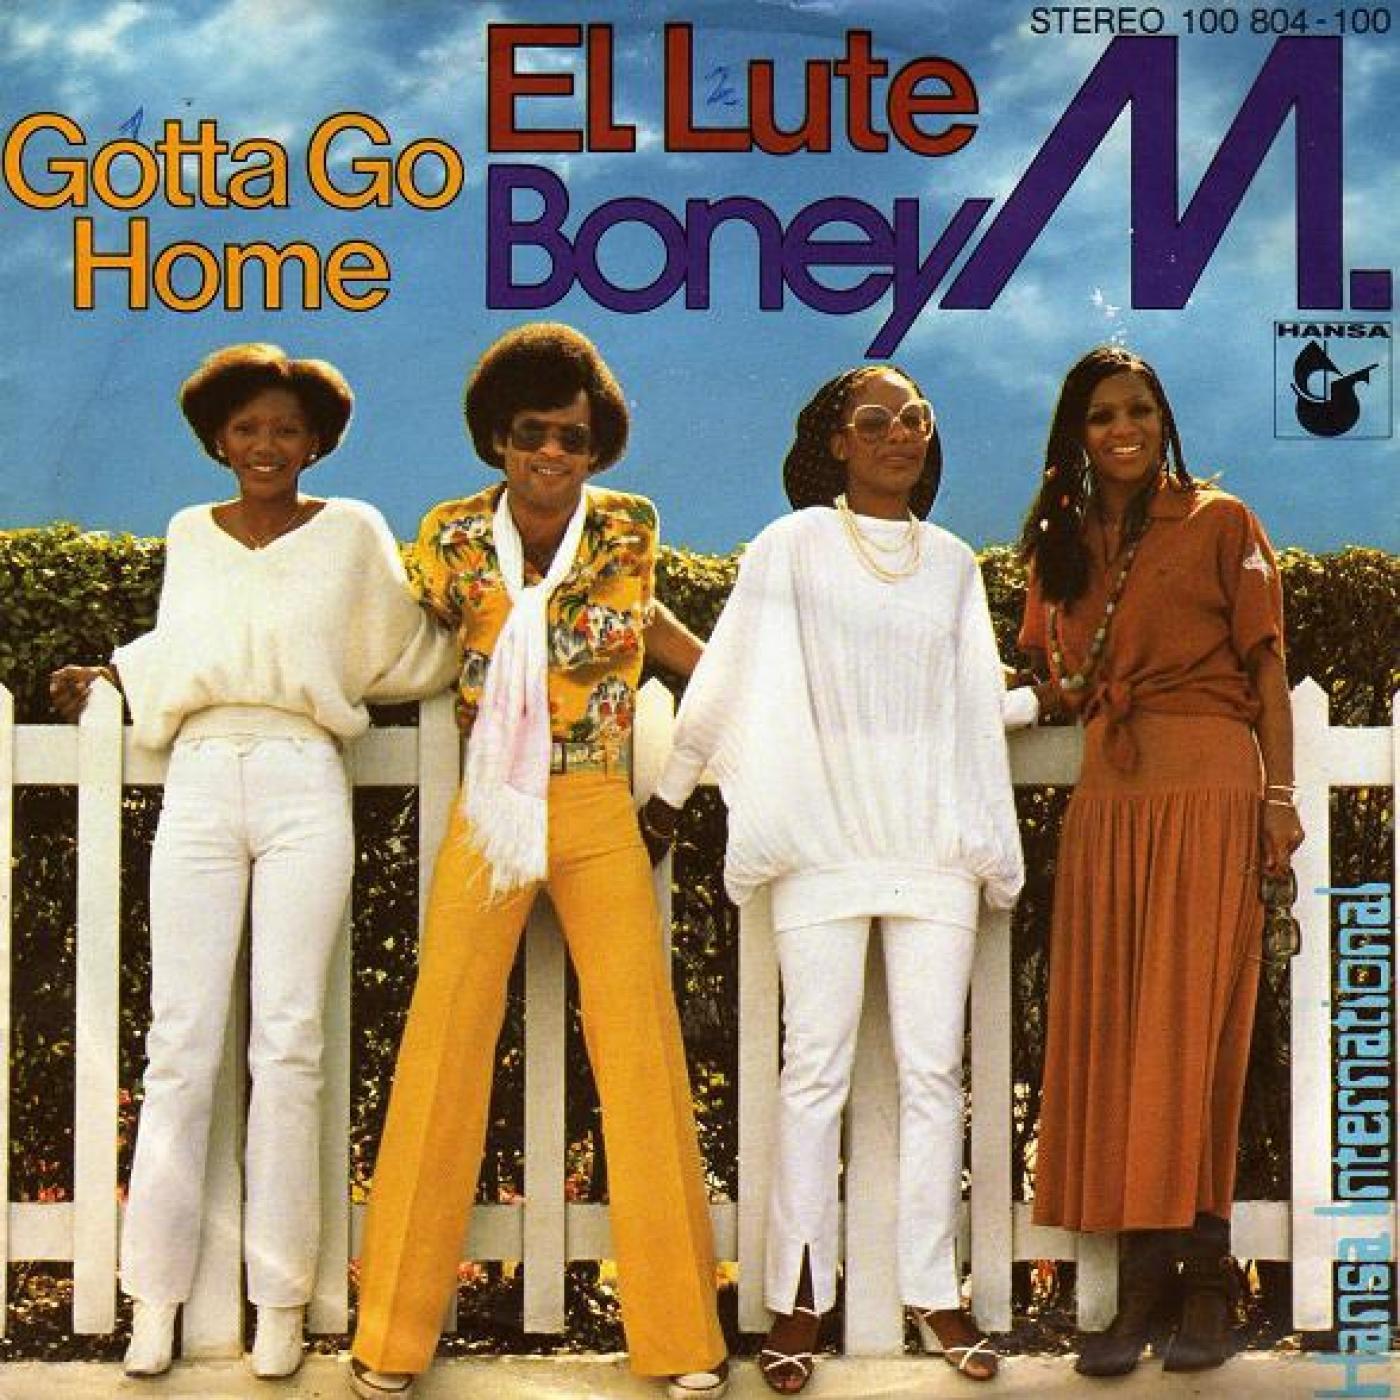 boney m el lute mp3 download